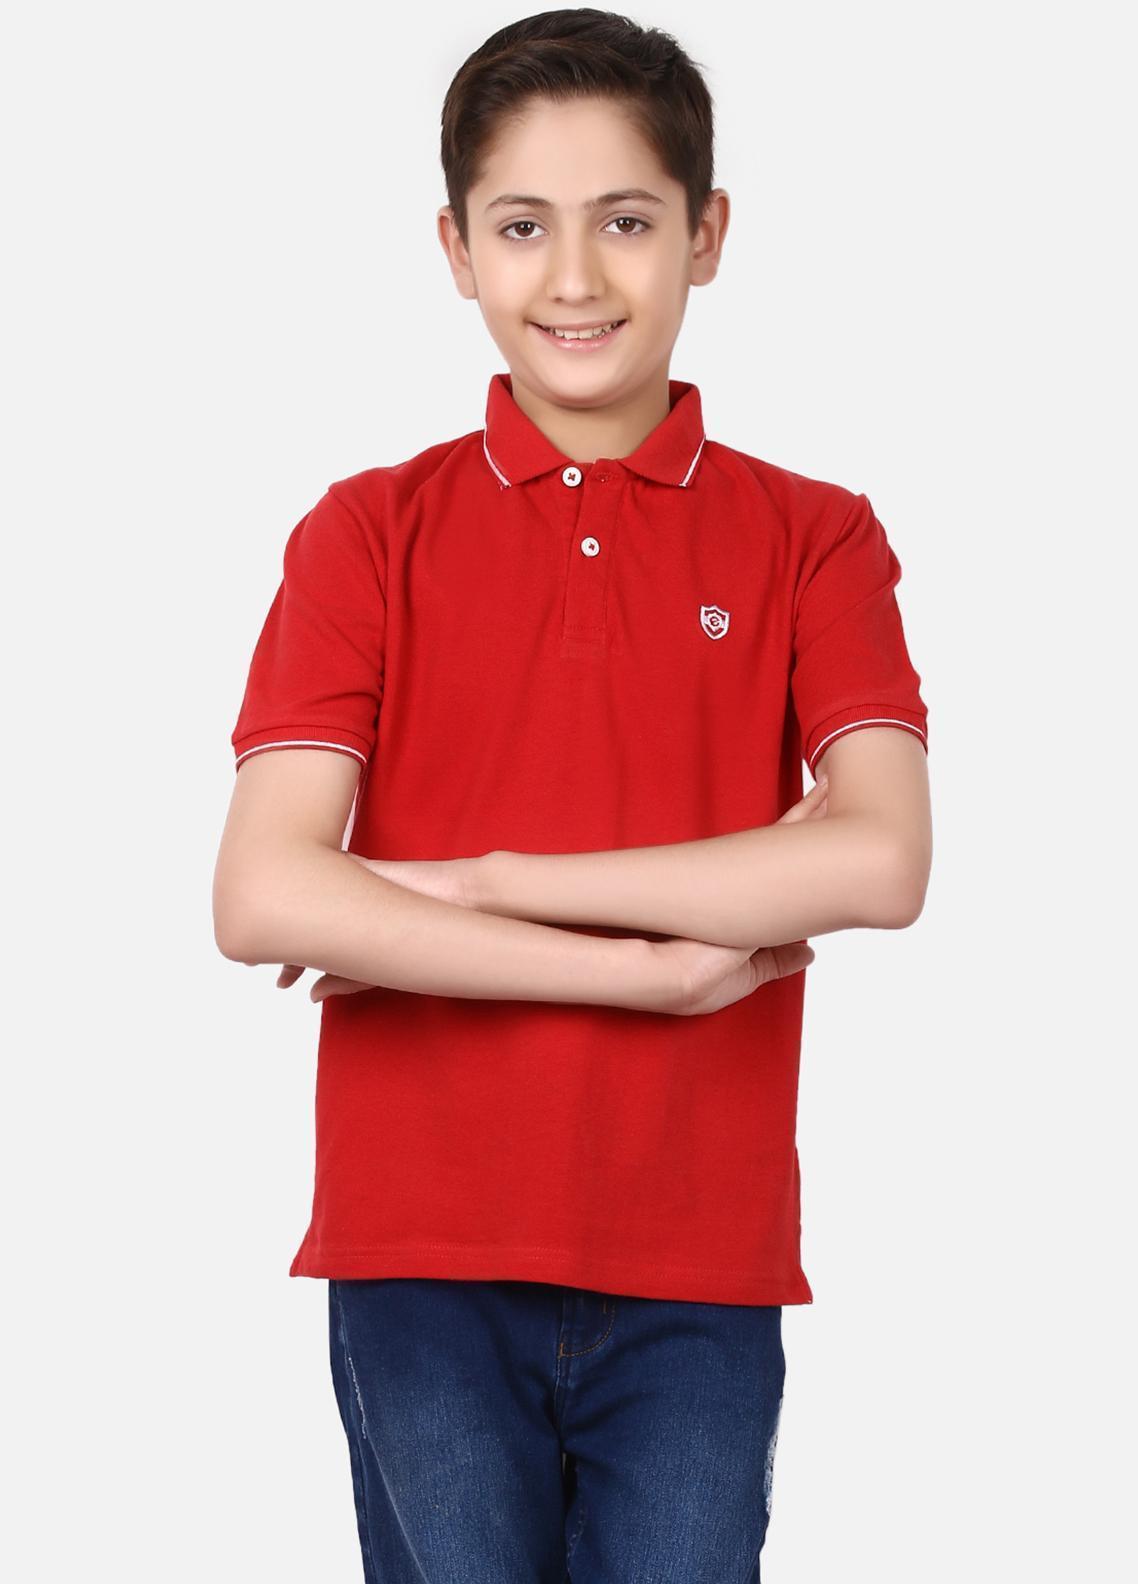 Edenrobe Cotton Polo Shirts for Boys - Red EBTPS19-020